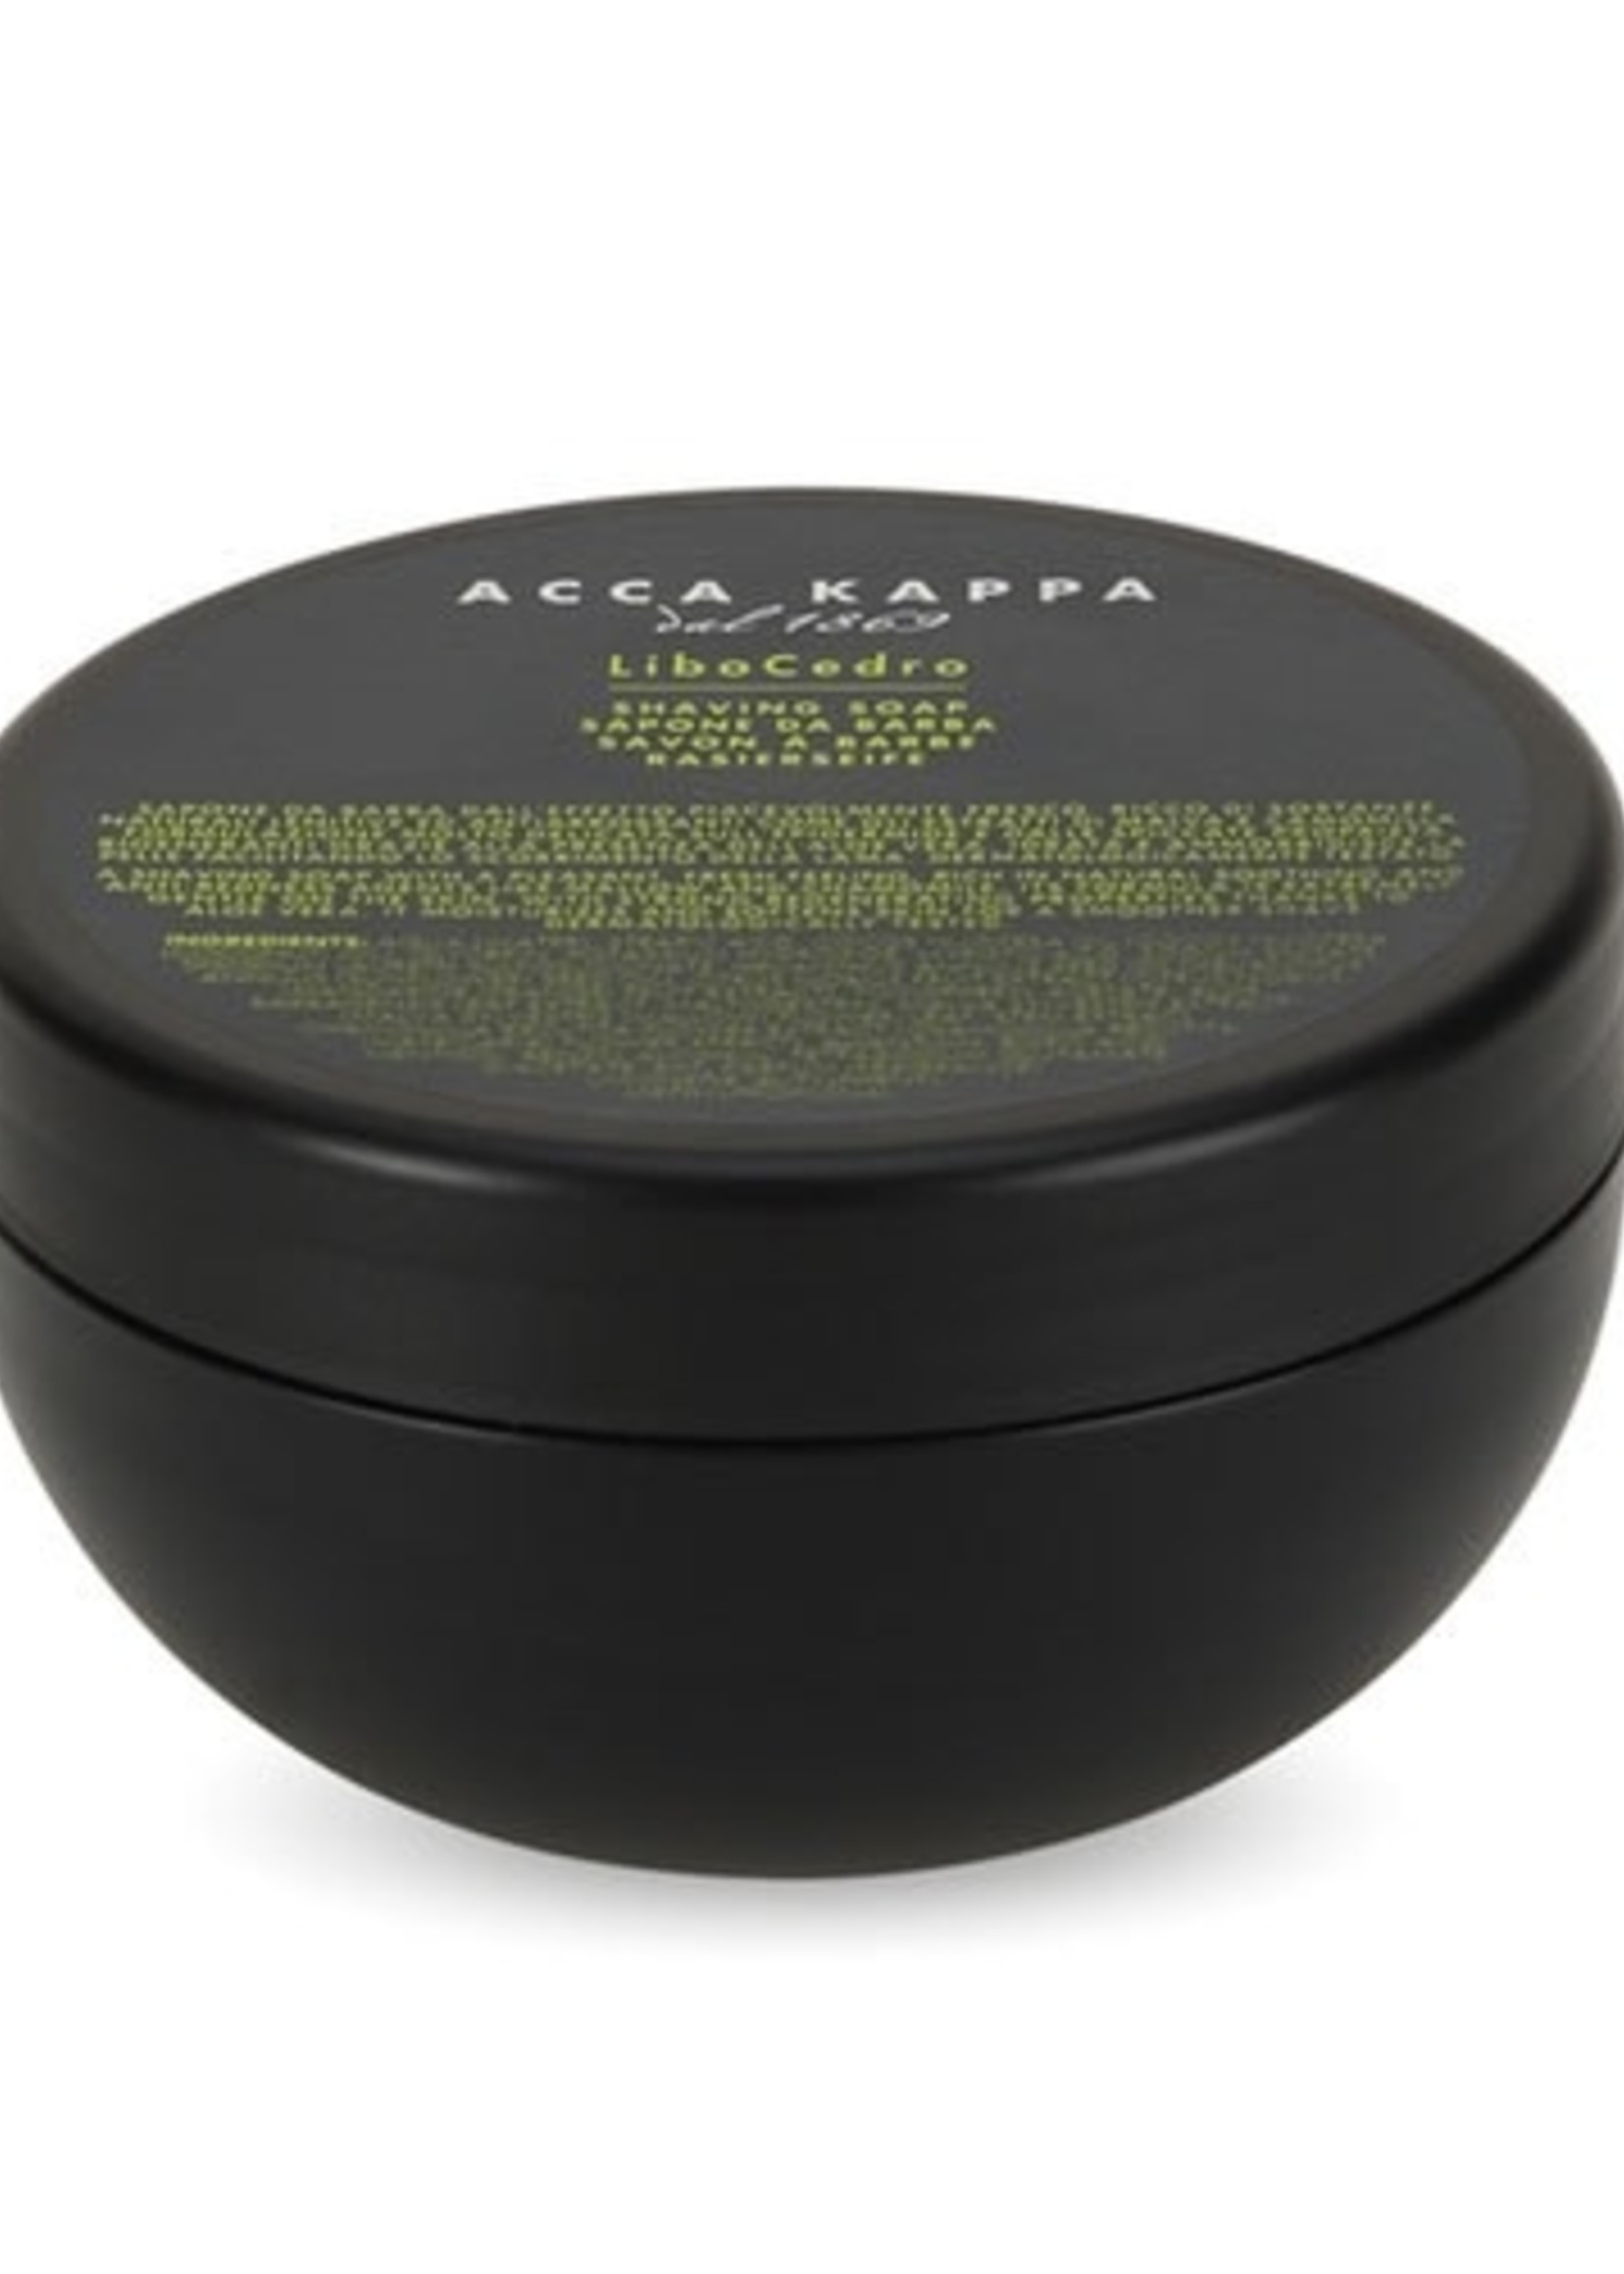 Acca Kappa Acca Kappa Cedar Shaving Soap